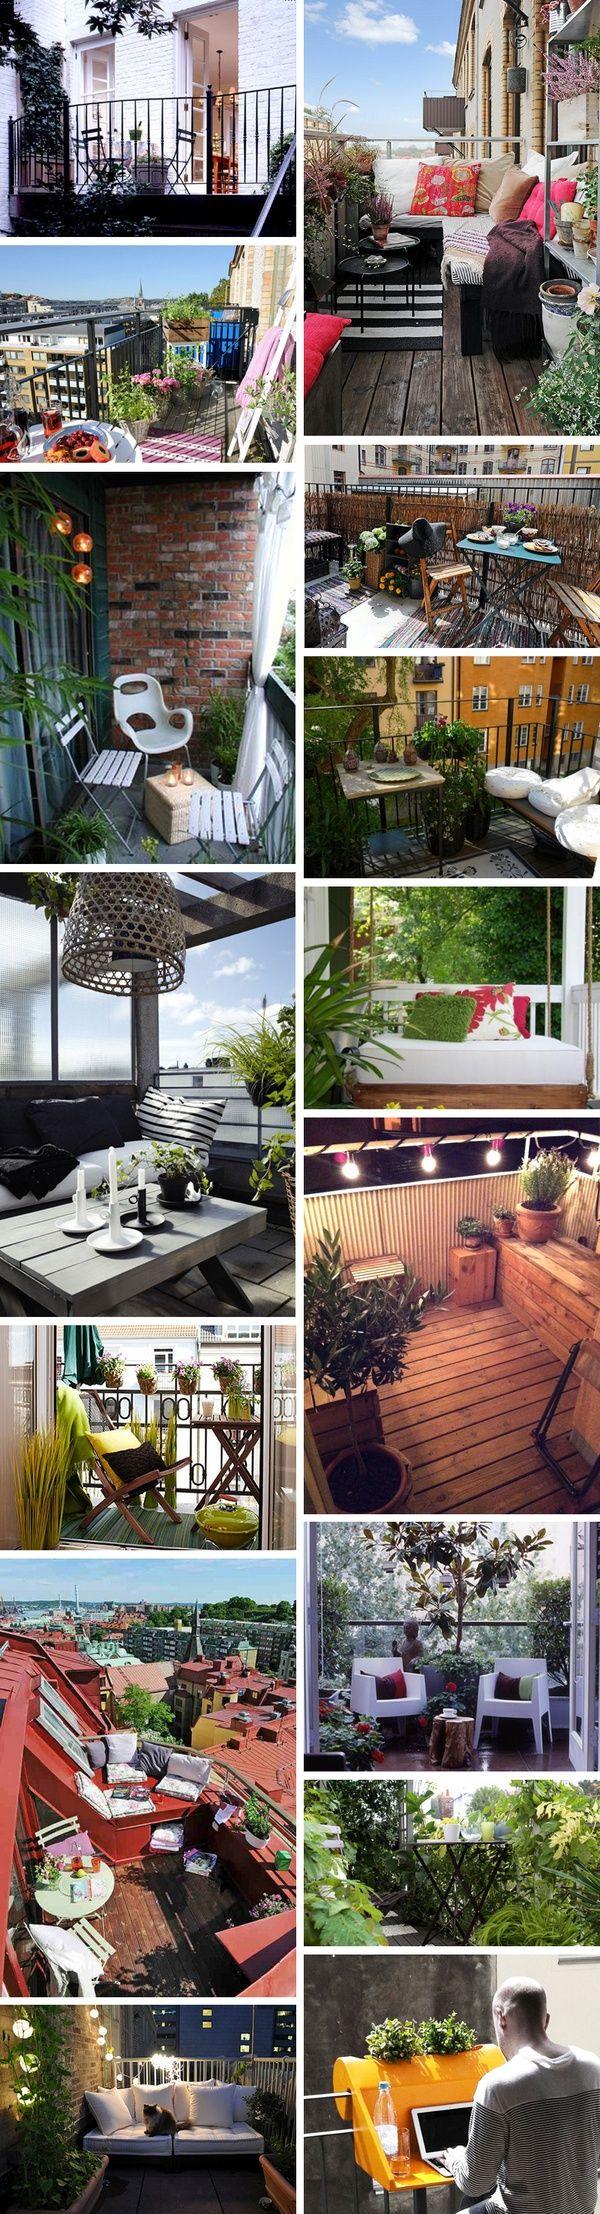 Best 25 balcony grill design ideas on pinterest balcony for Fall balcony decorating ideas